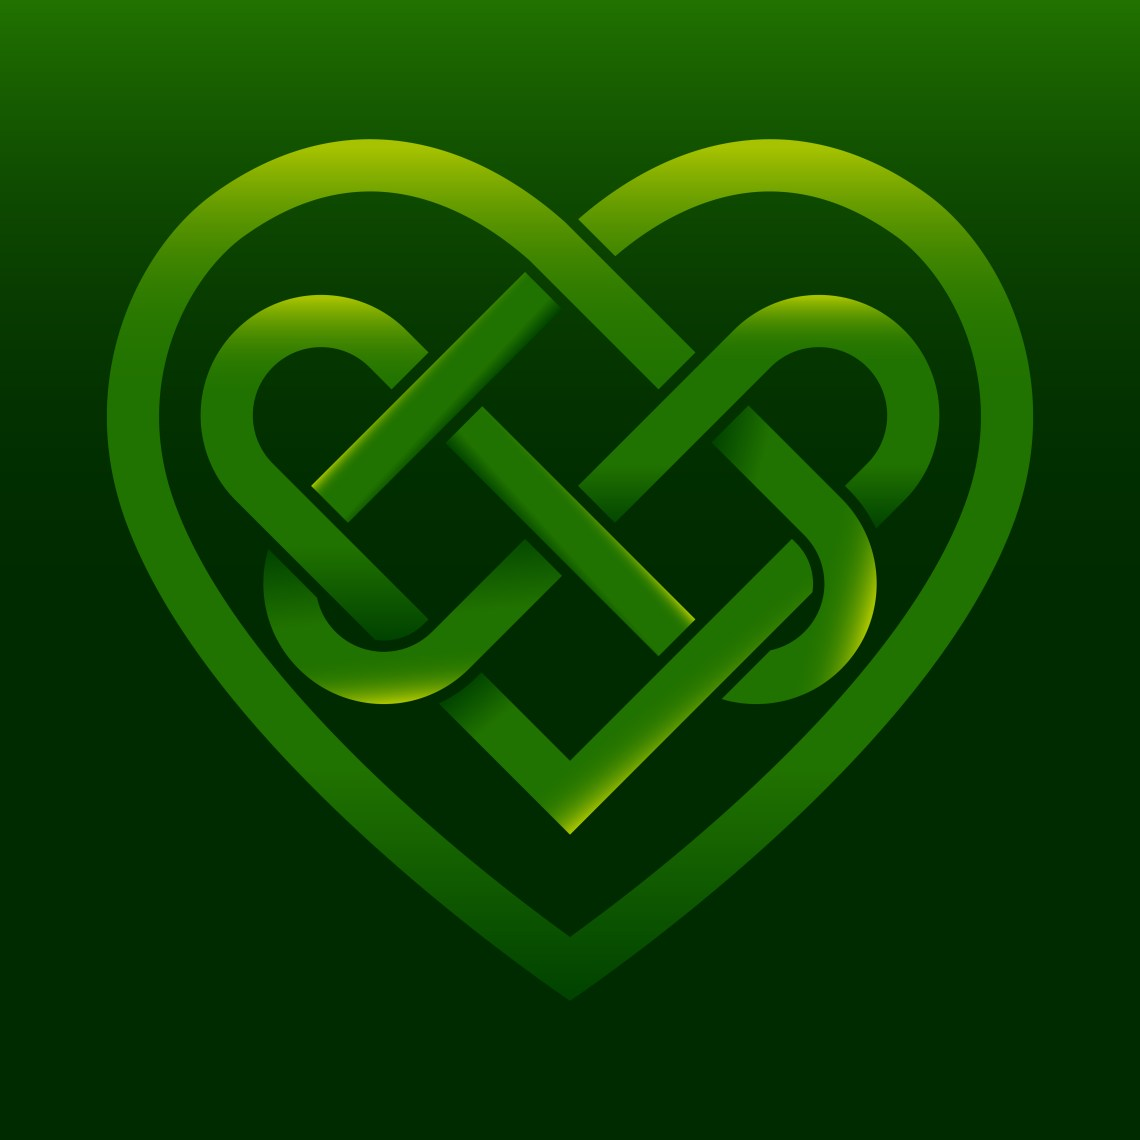 Download Celtic Heart Knot : Sterling Silver Celtic Love Knot Heart ...